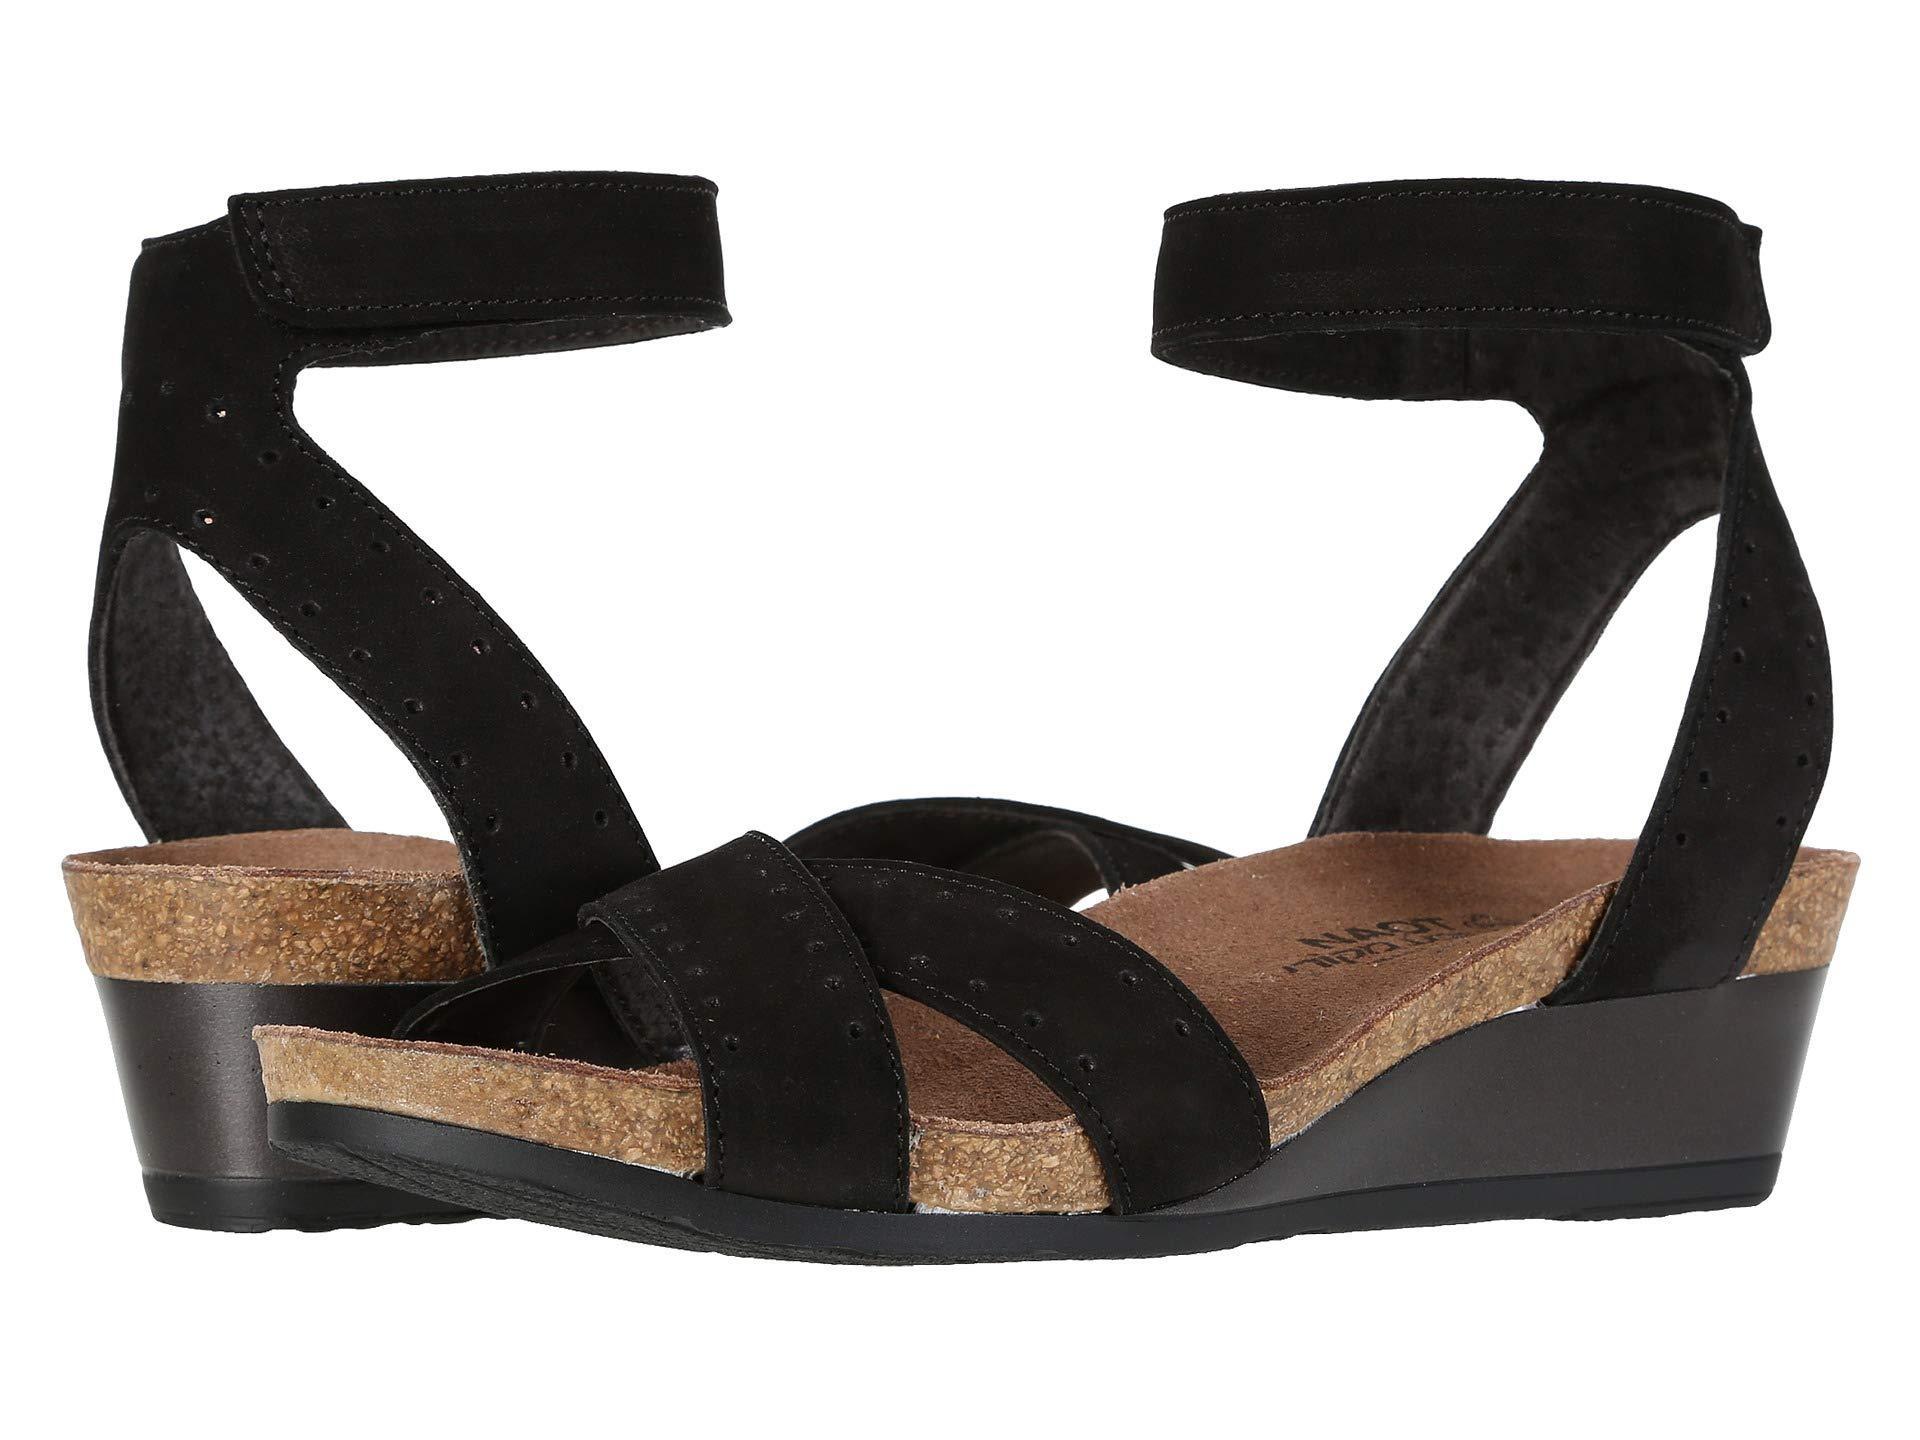 c335b0d7b556 Lyst - Naot Wand (navy Velvet Nubuck glass Brown) Women s Shoes in Black